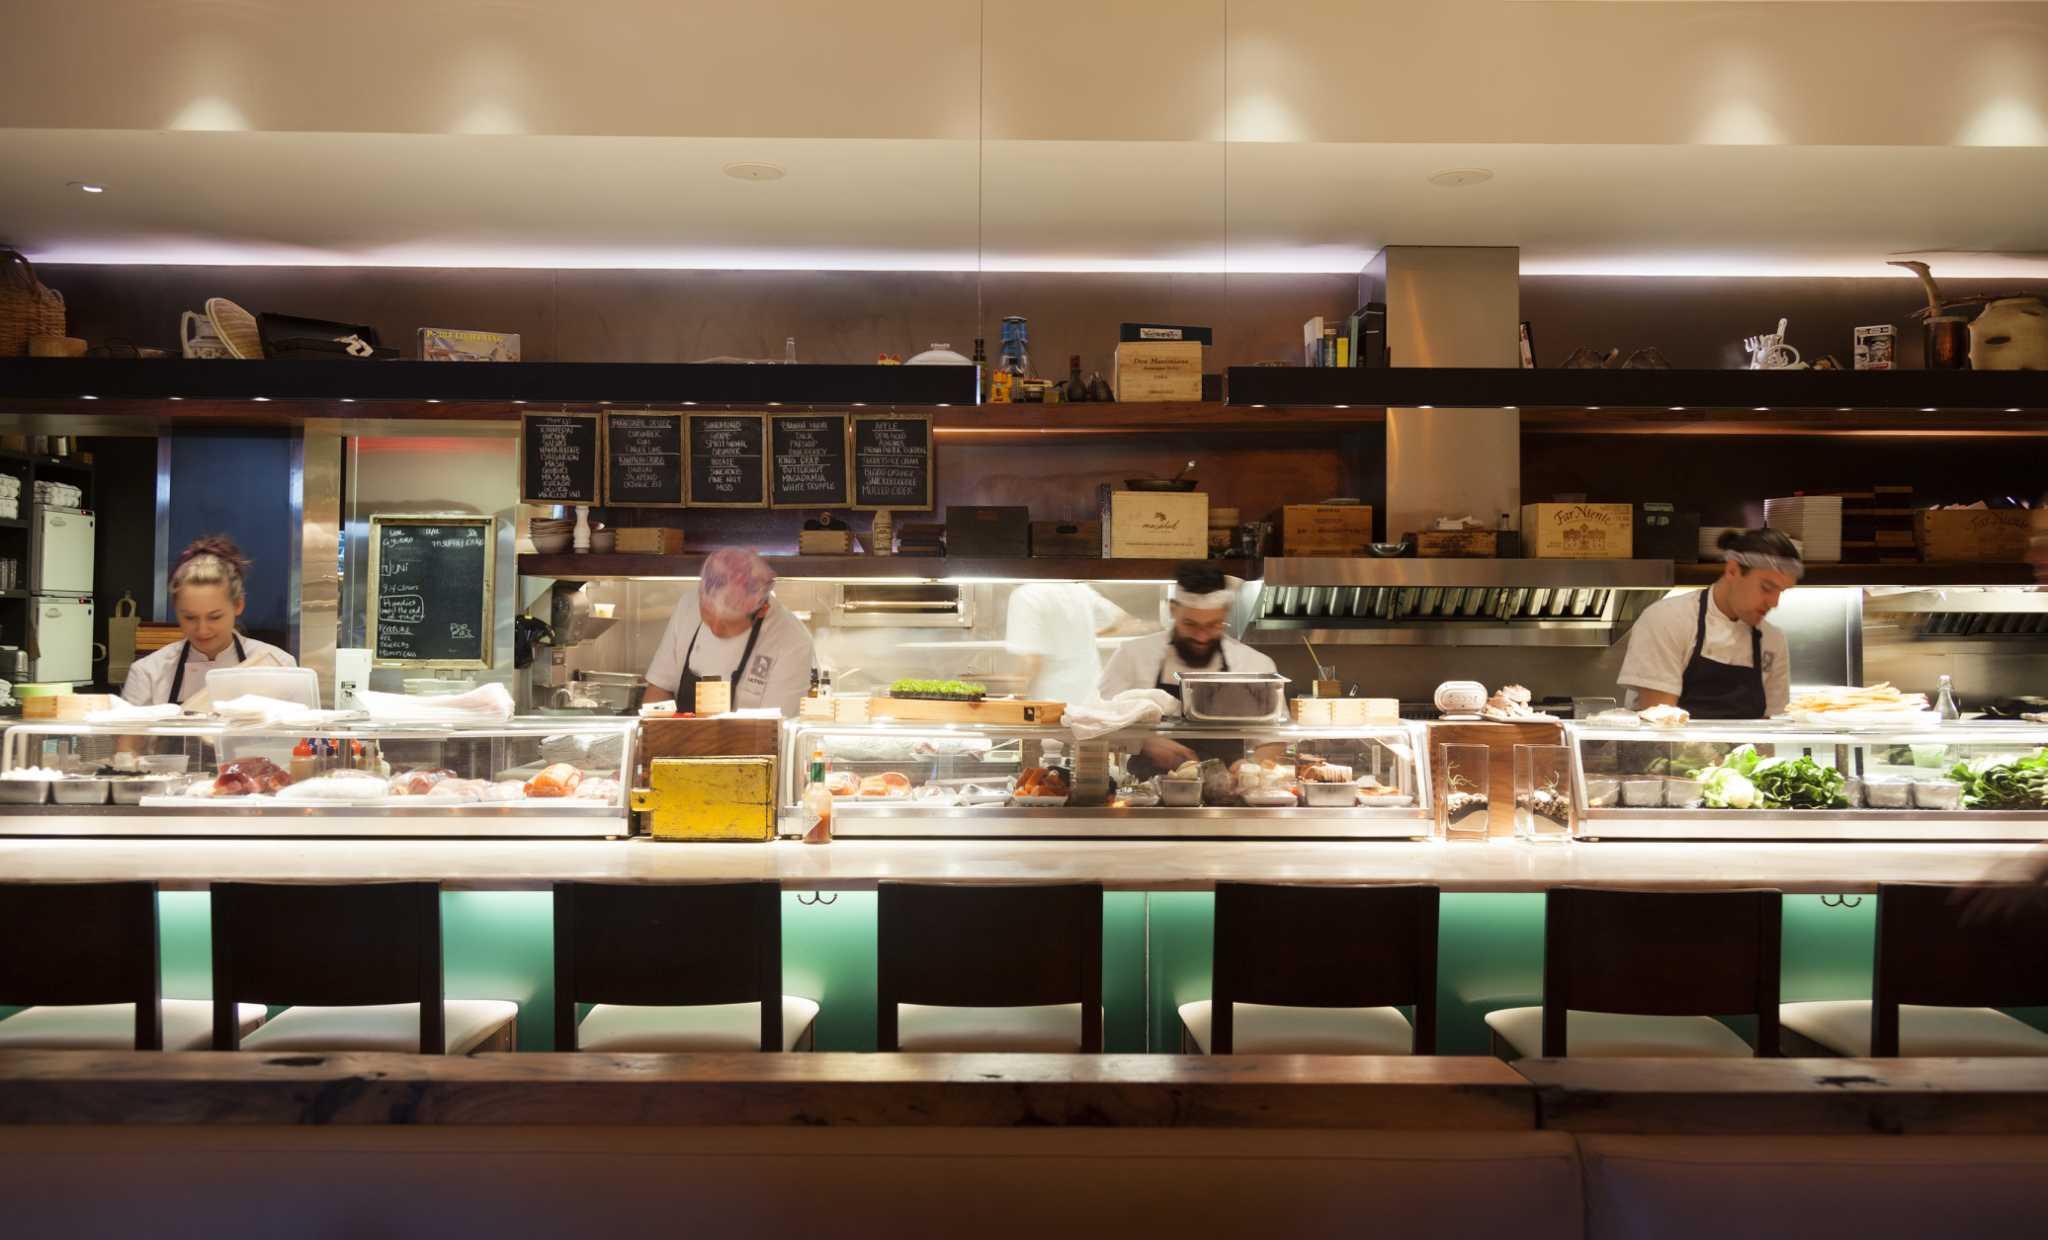 Austin Japanese restaurant Uchiko to open in Houston